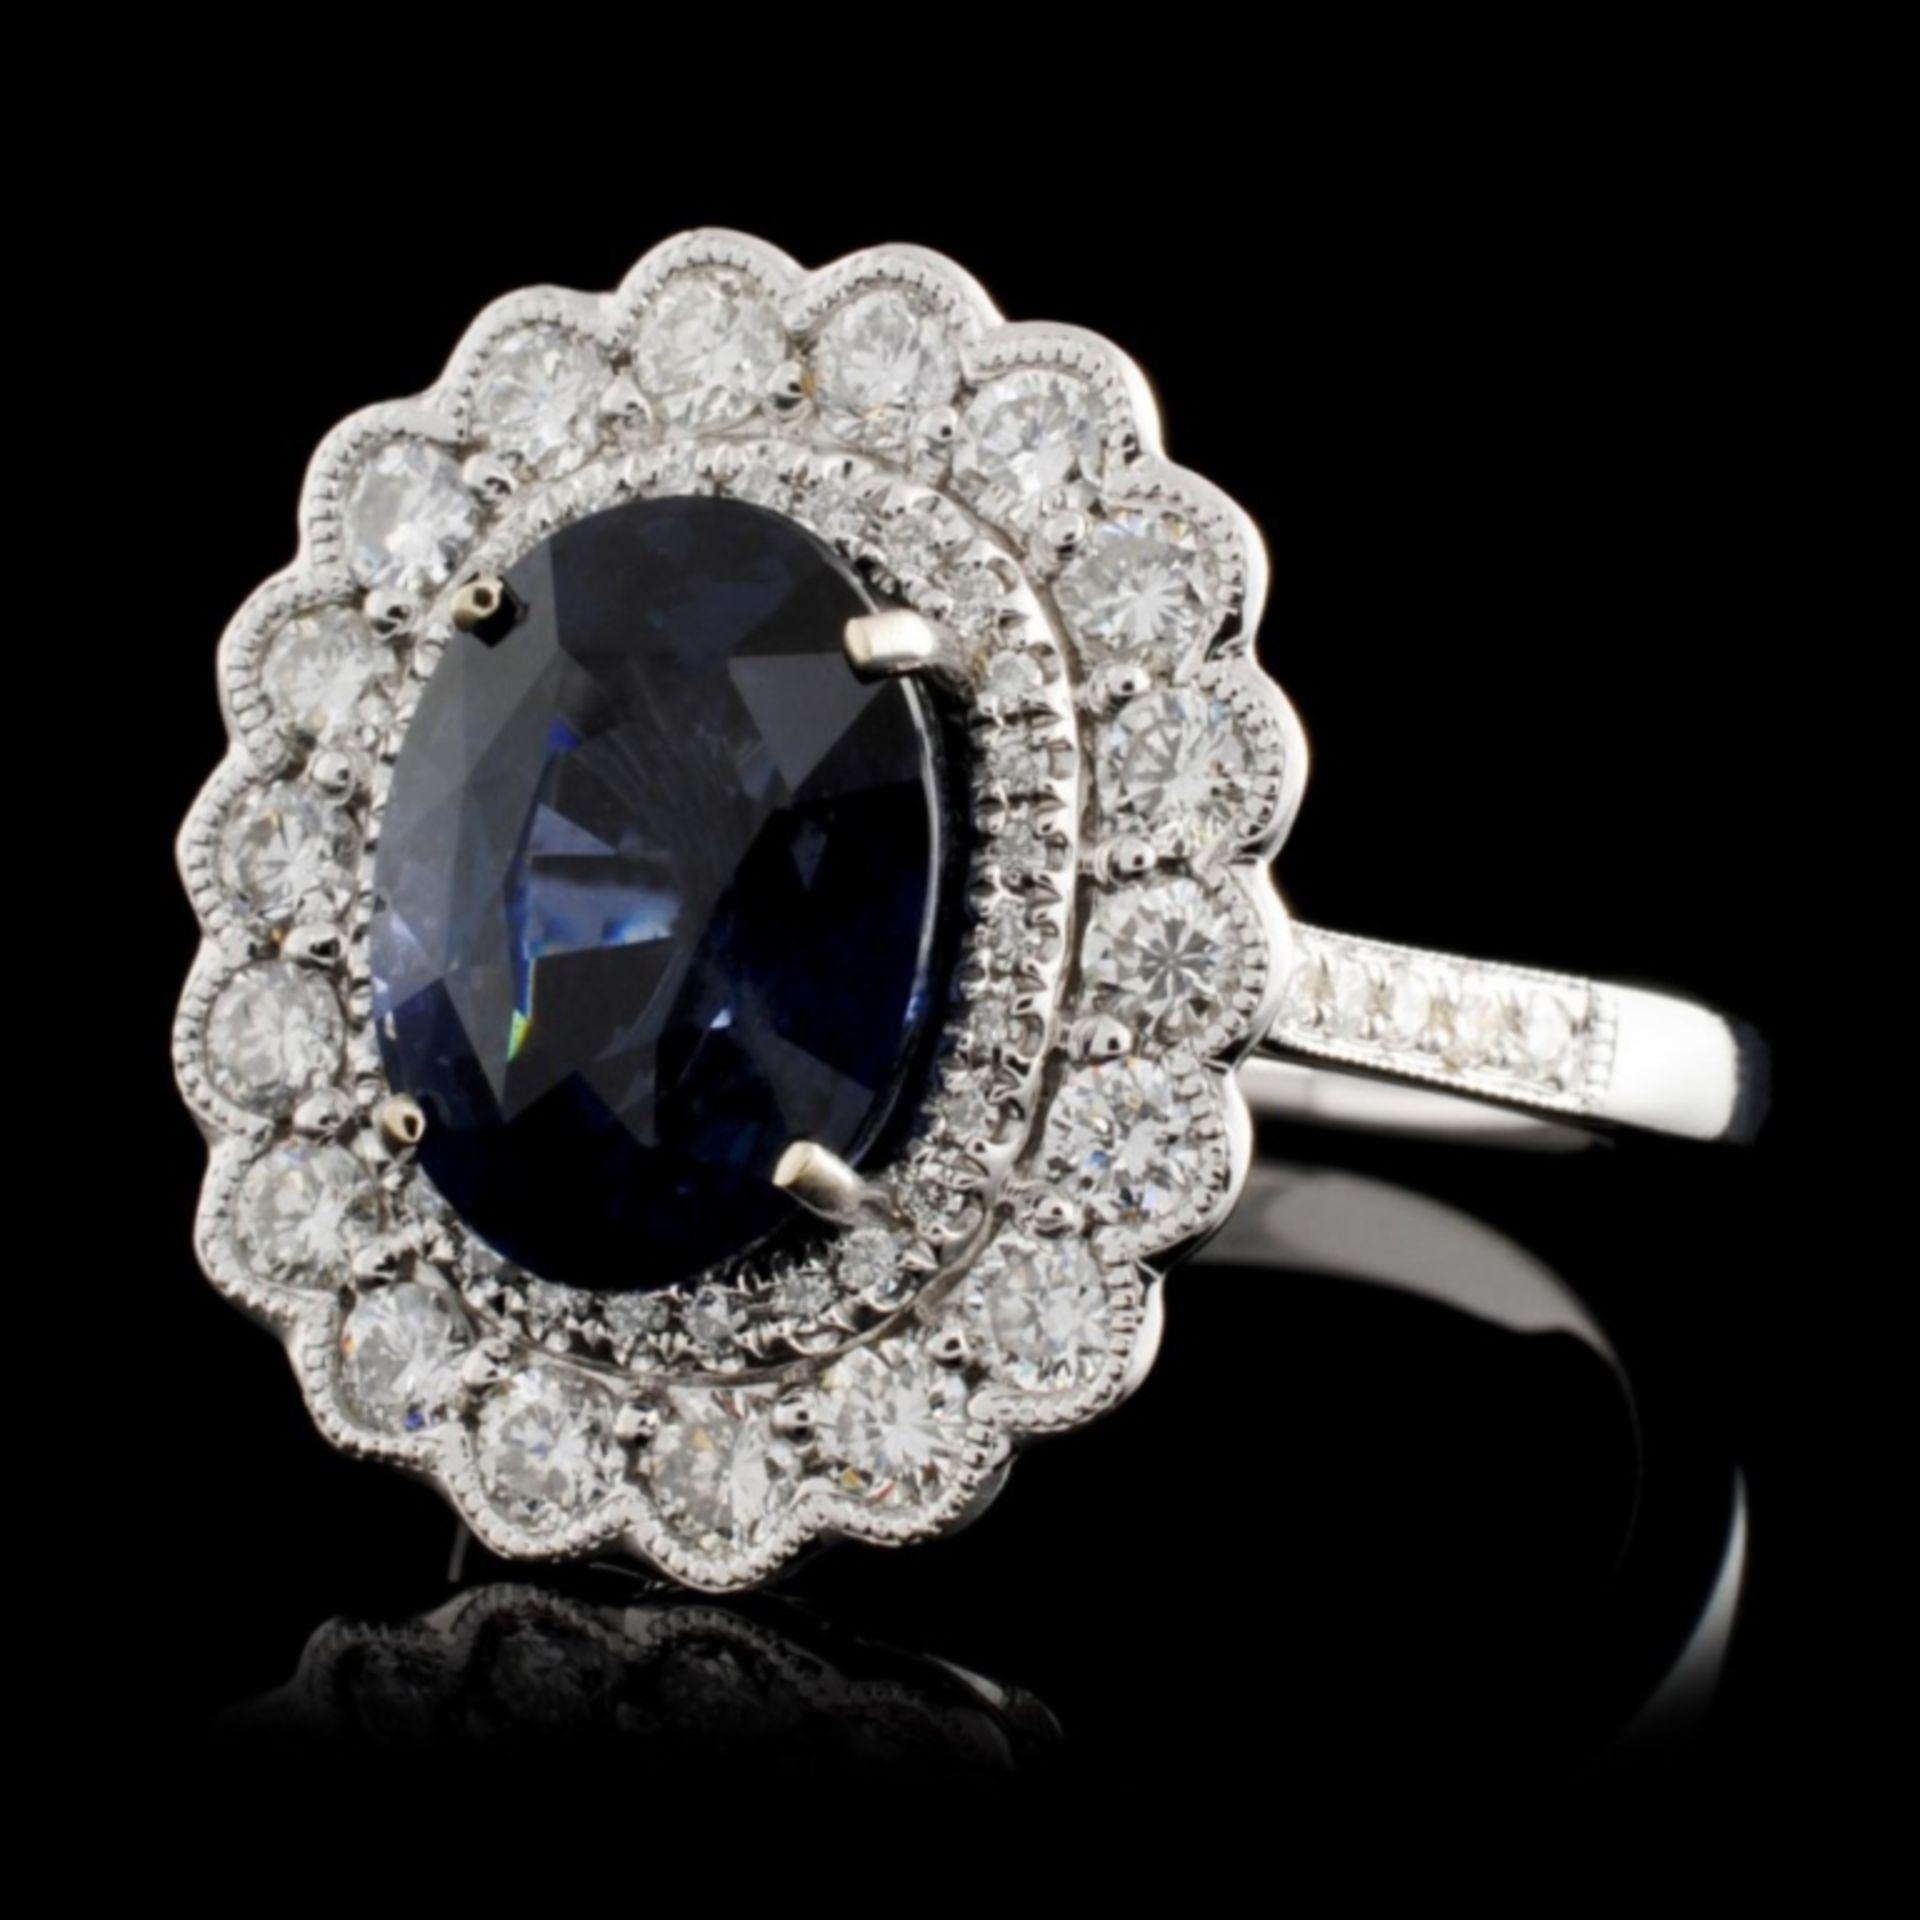 18K White Gold 3.52ct Spinel & 0.78ct Diamond Ring - Image 2 of 4